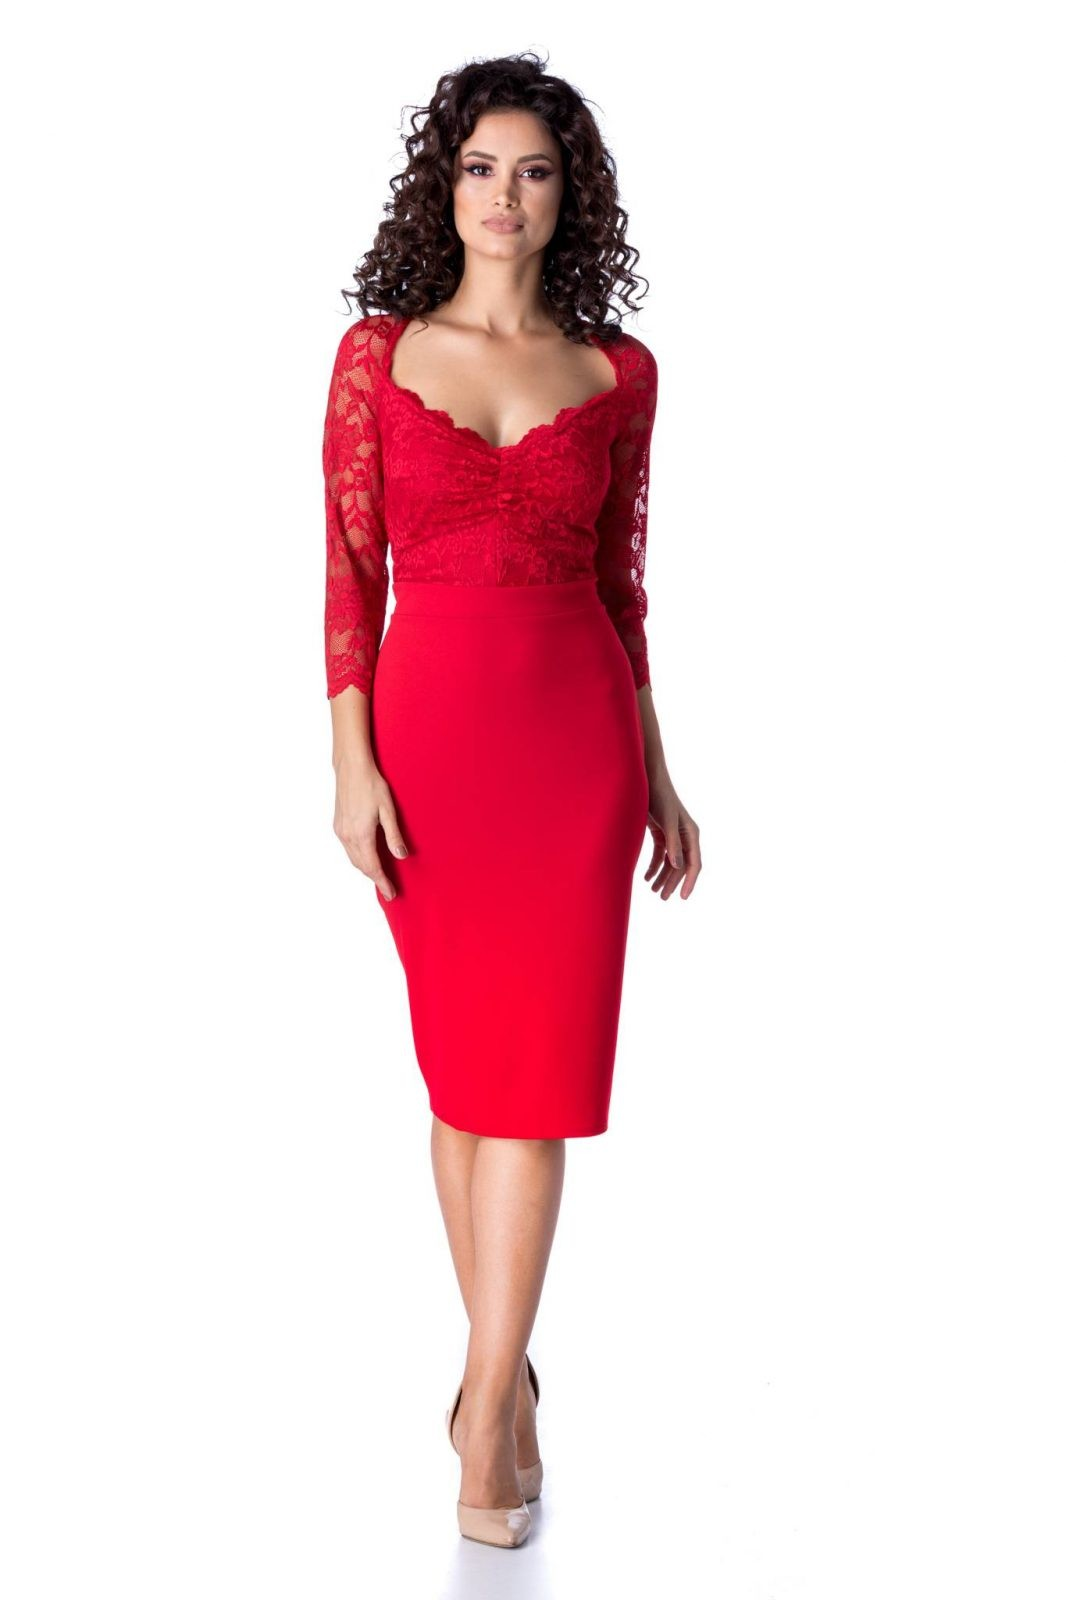 Norra Κόκκινο Φόρεμα 2255